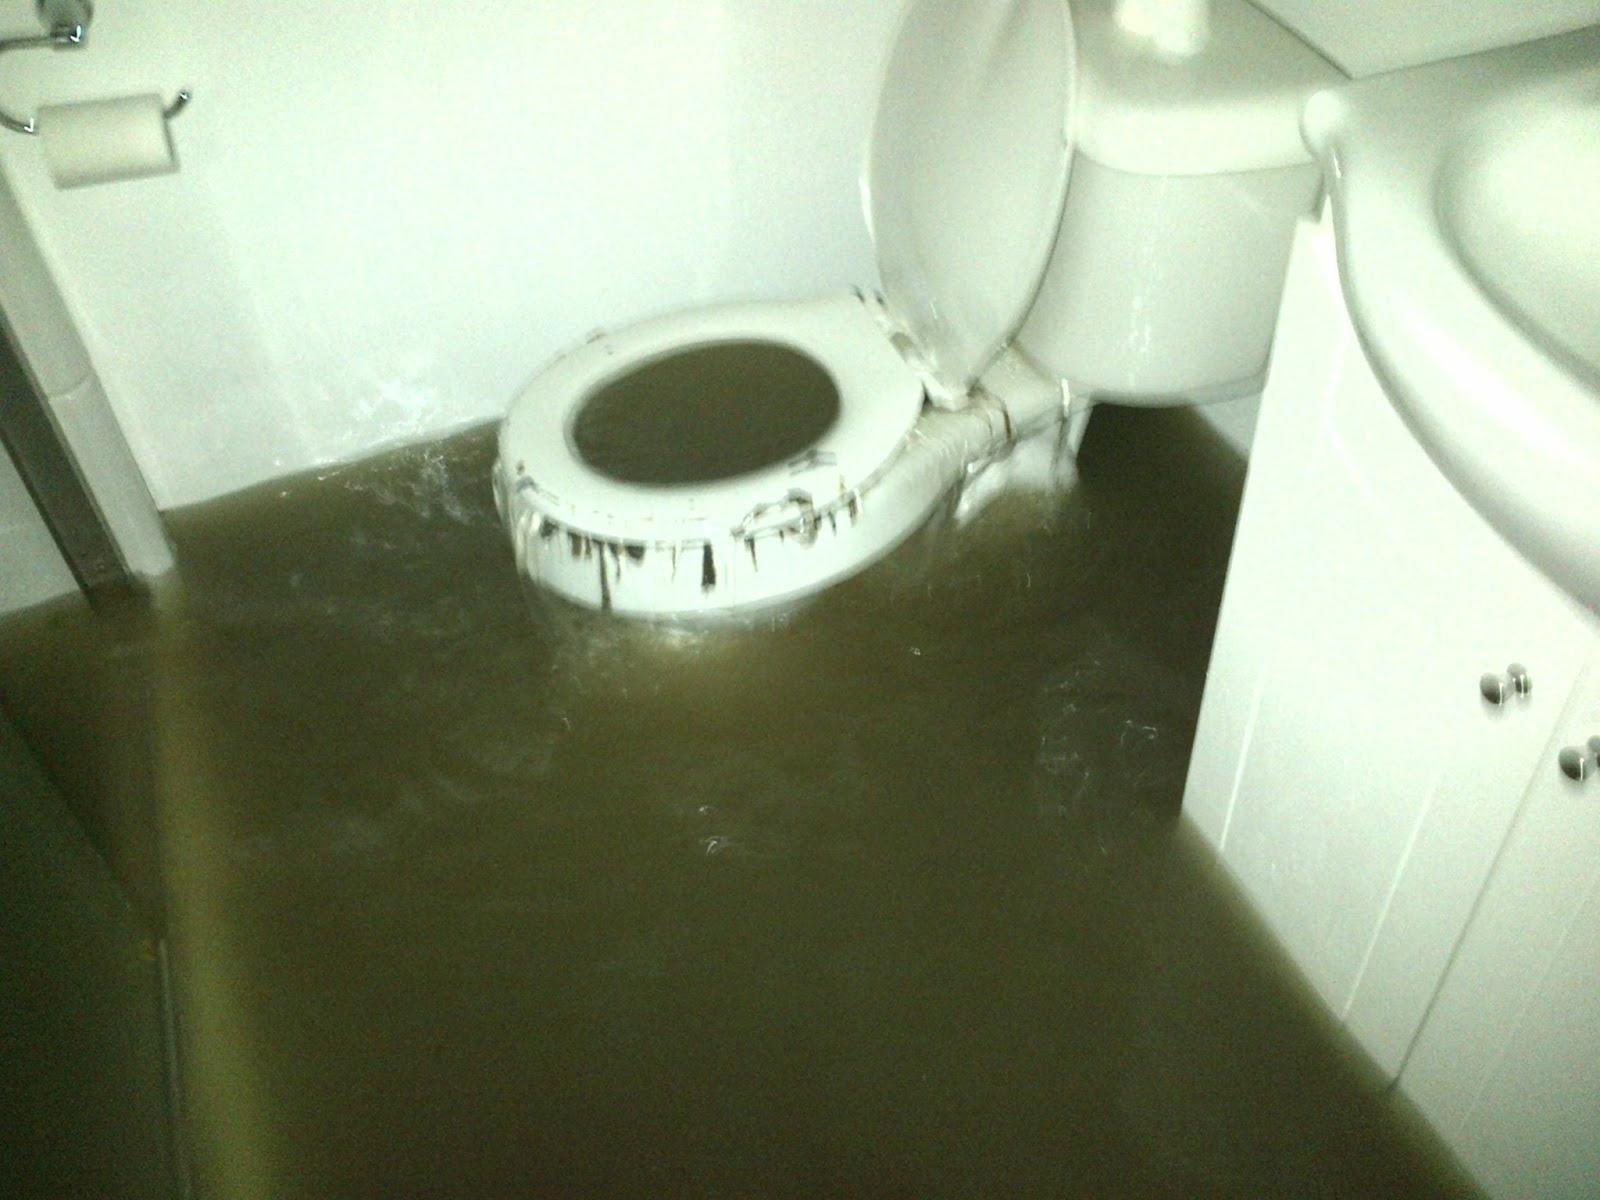 Toilets For Basements Upflush Toilets For Basements Upflush toilet for basement flush up toilets decoration 1600 X 1200